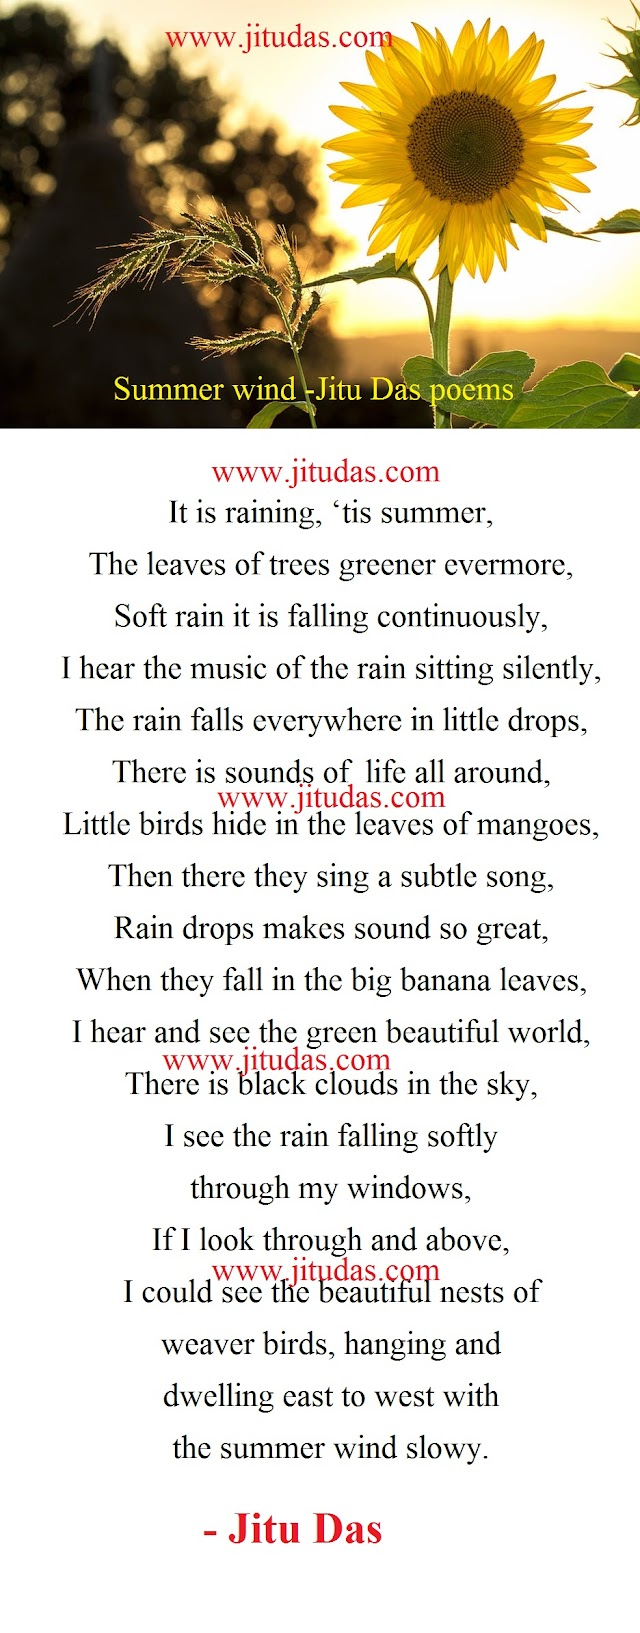 Life poems,Summer wind poem by Jitu Das english poems